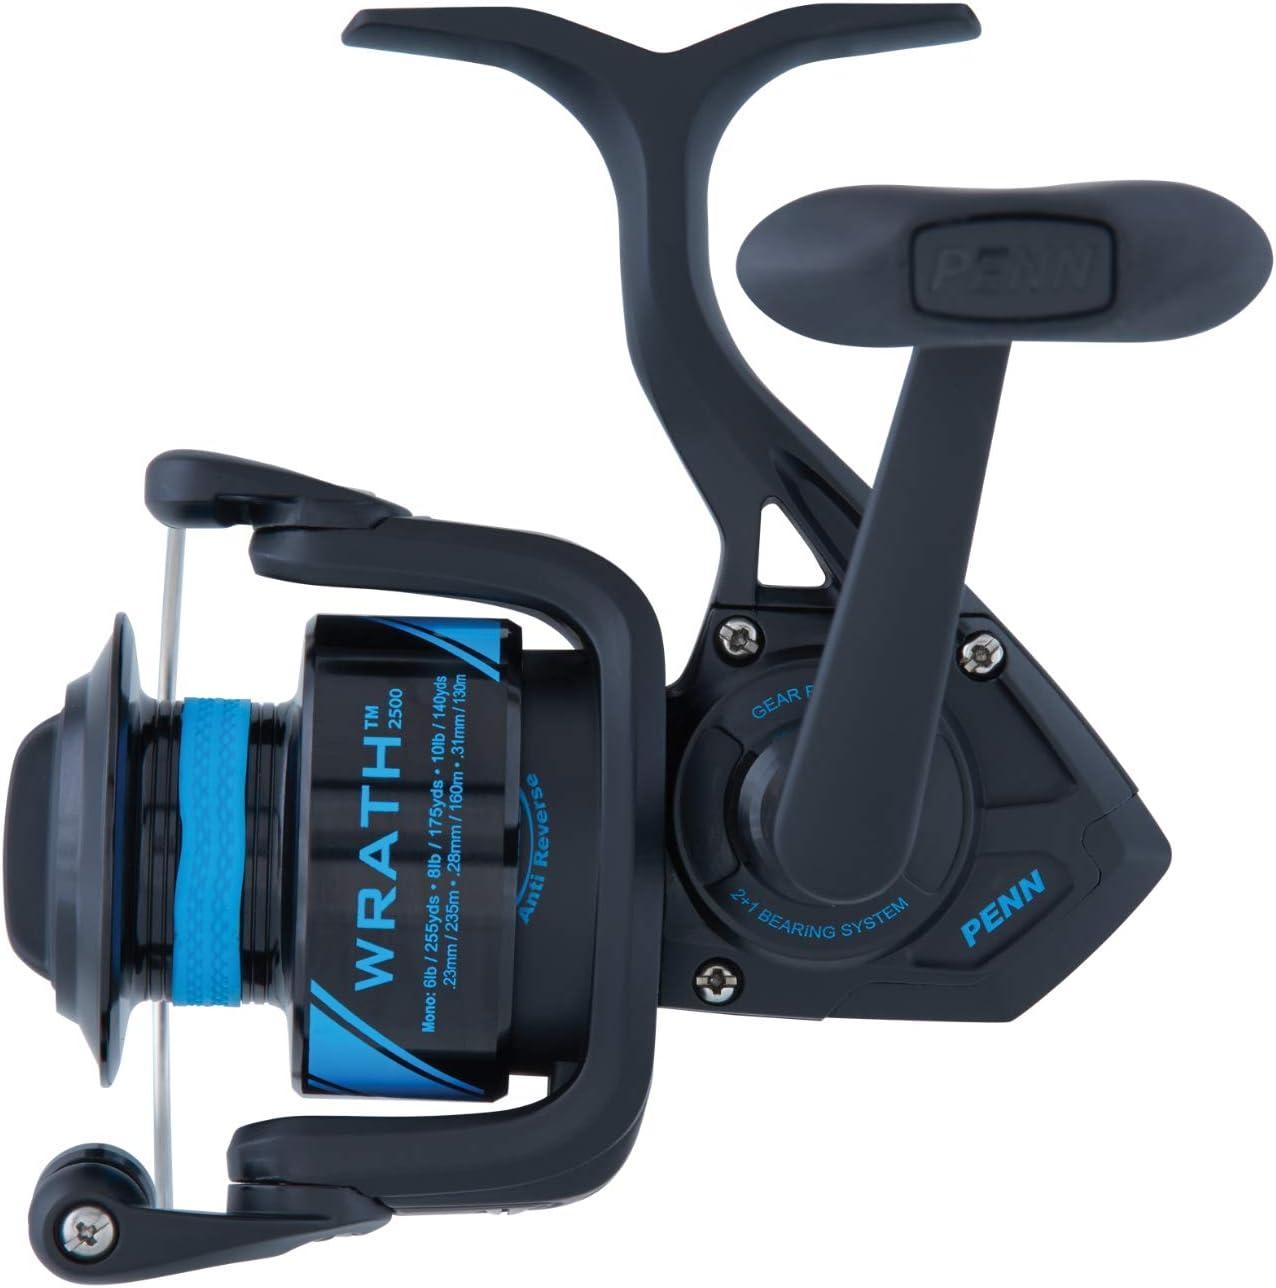 WRTH2500C PENN Wrath Spinning Fishing Reel